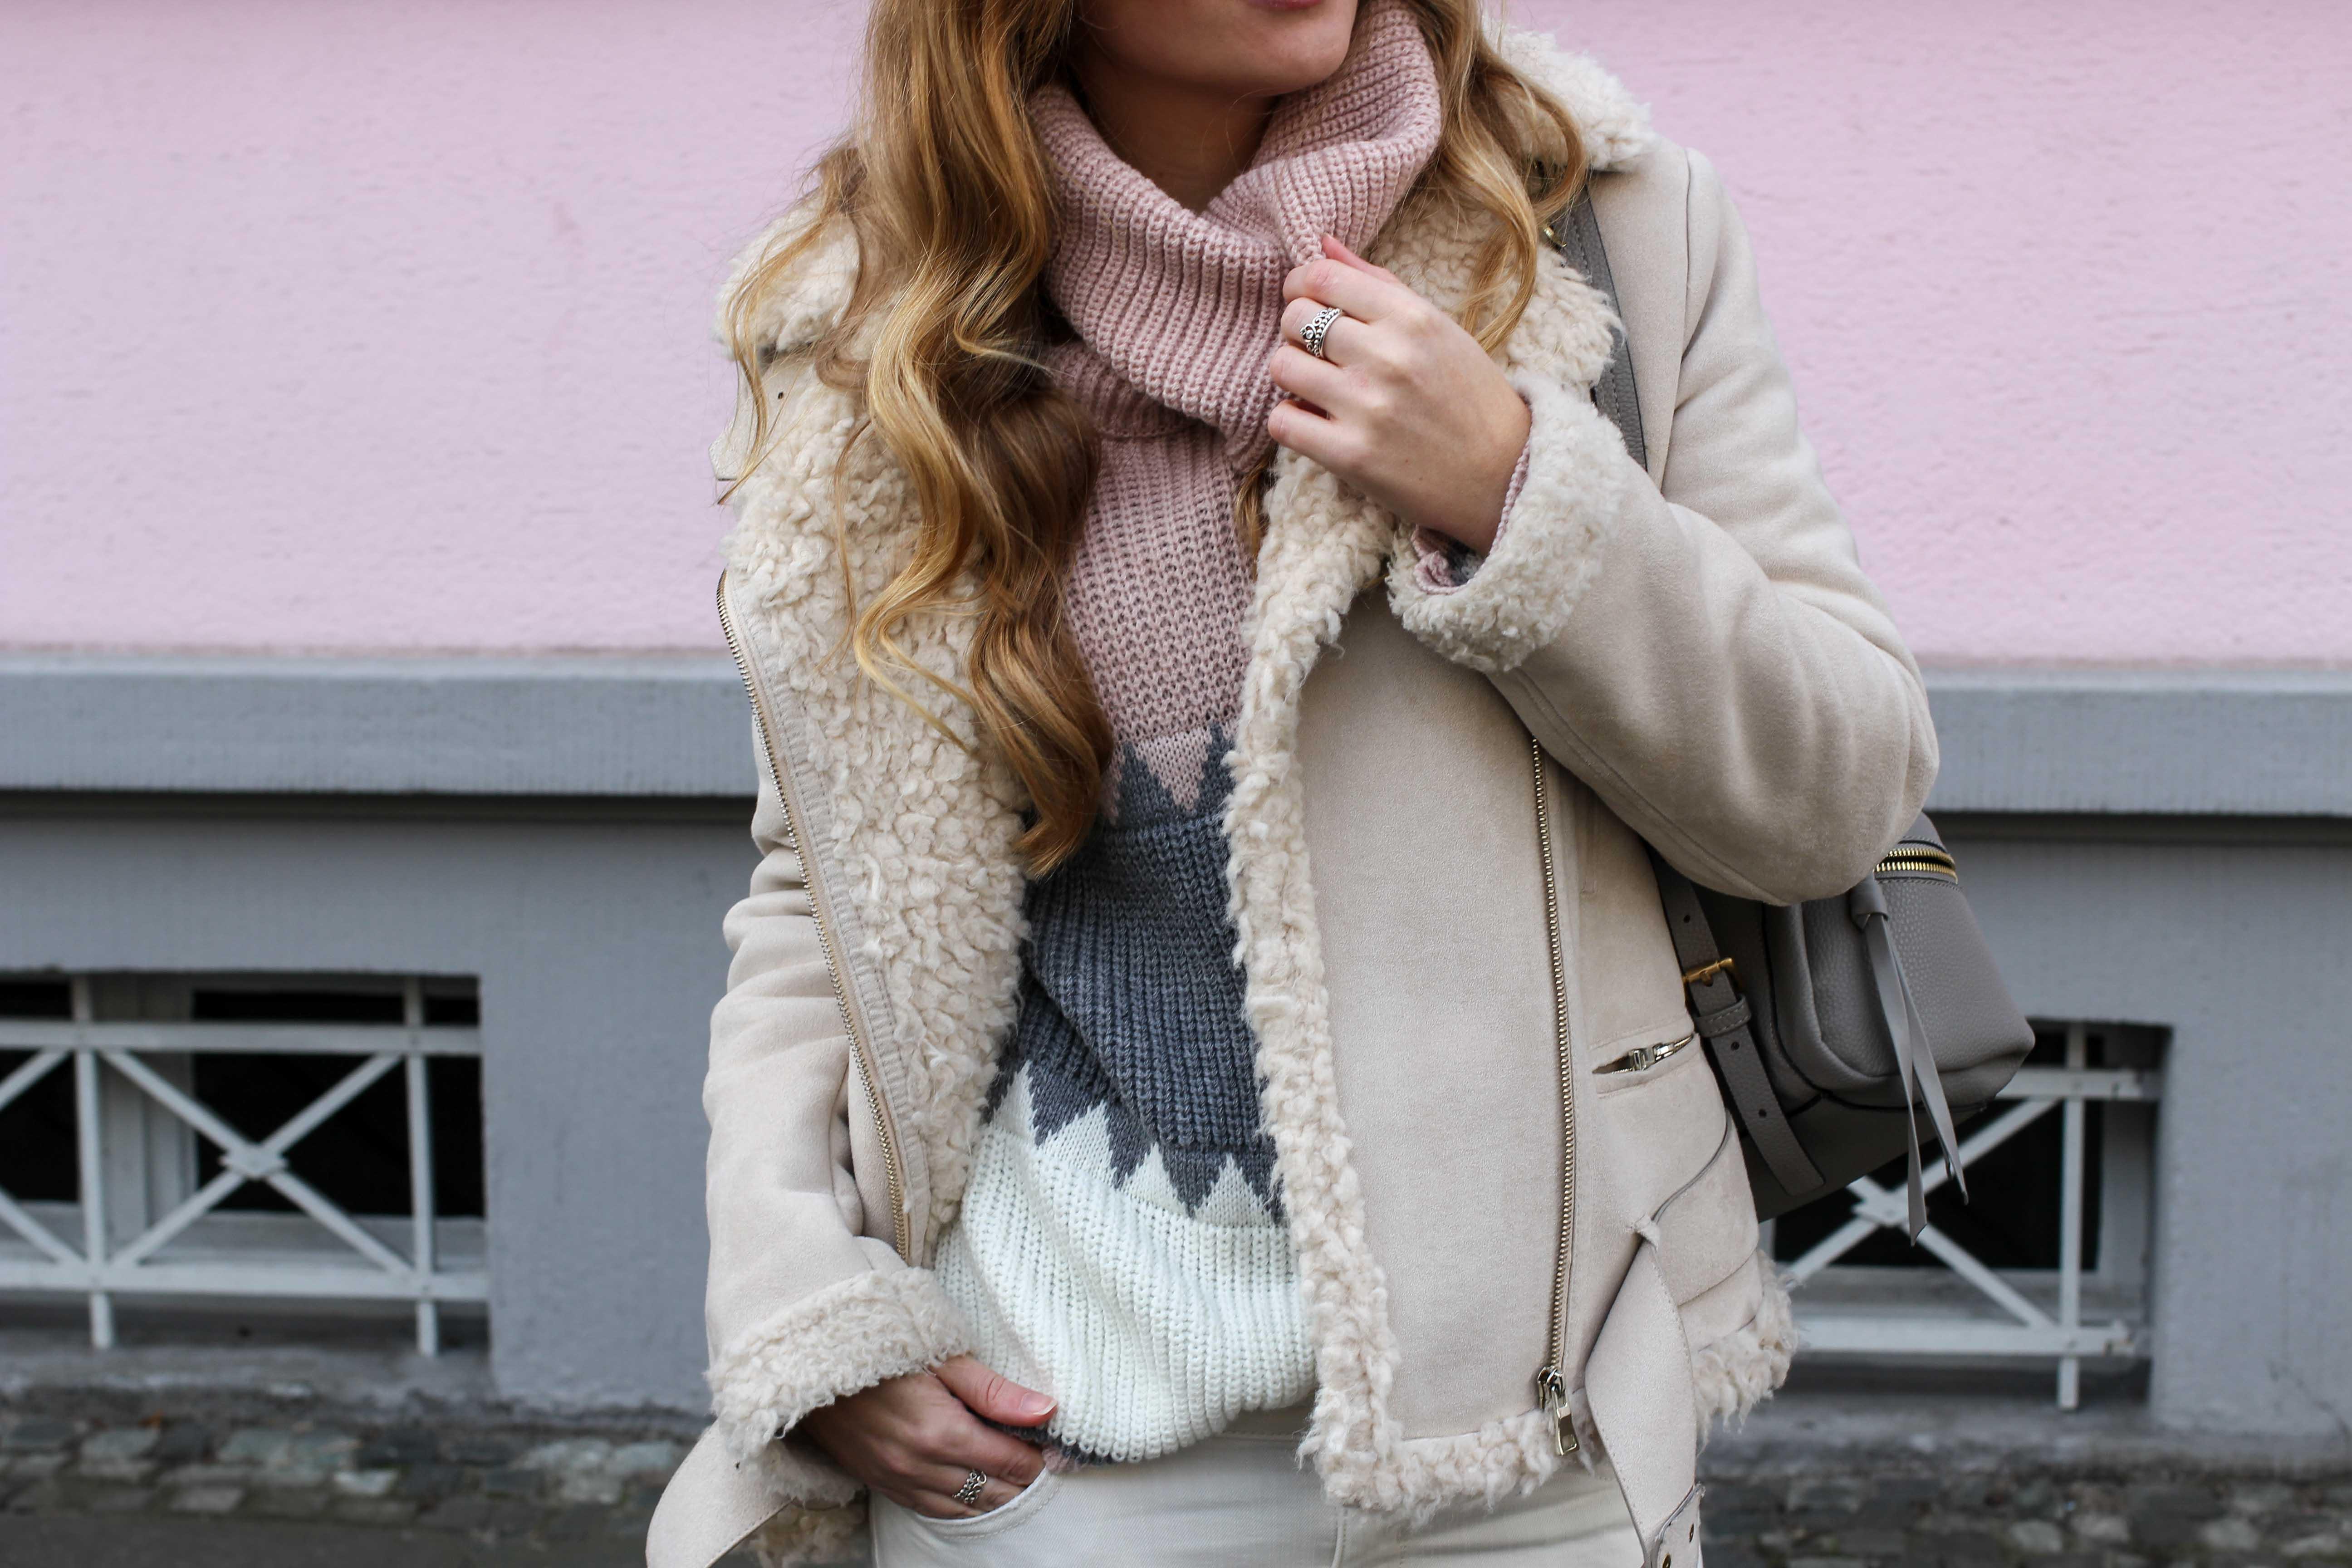 All White Winter Look Helle Farben Winter Kustlammfelljacke Zara rosa Rollkragenpullover Modeblog Bonn Streetstyle Outfit 4